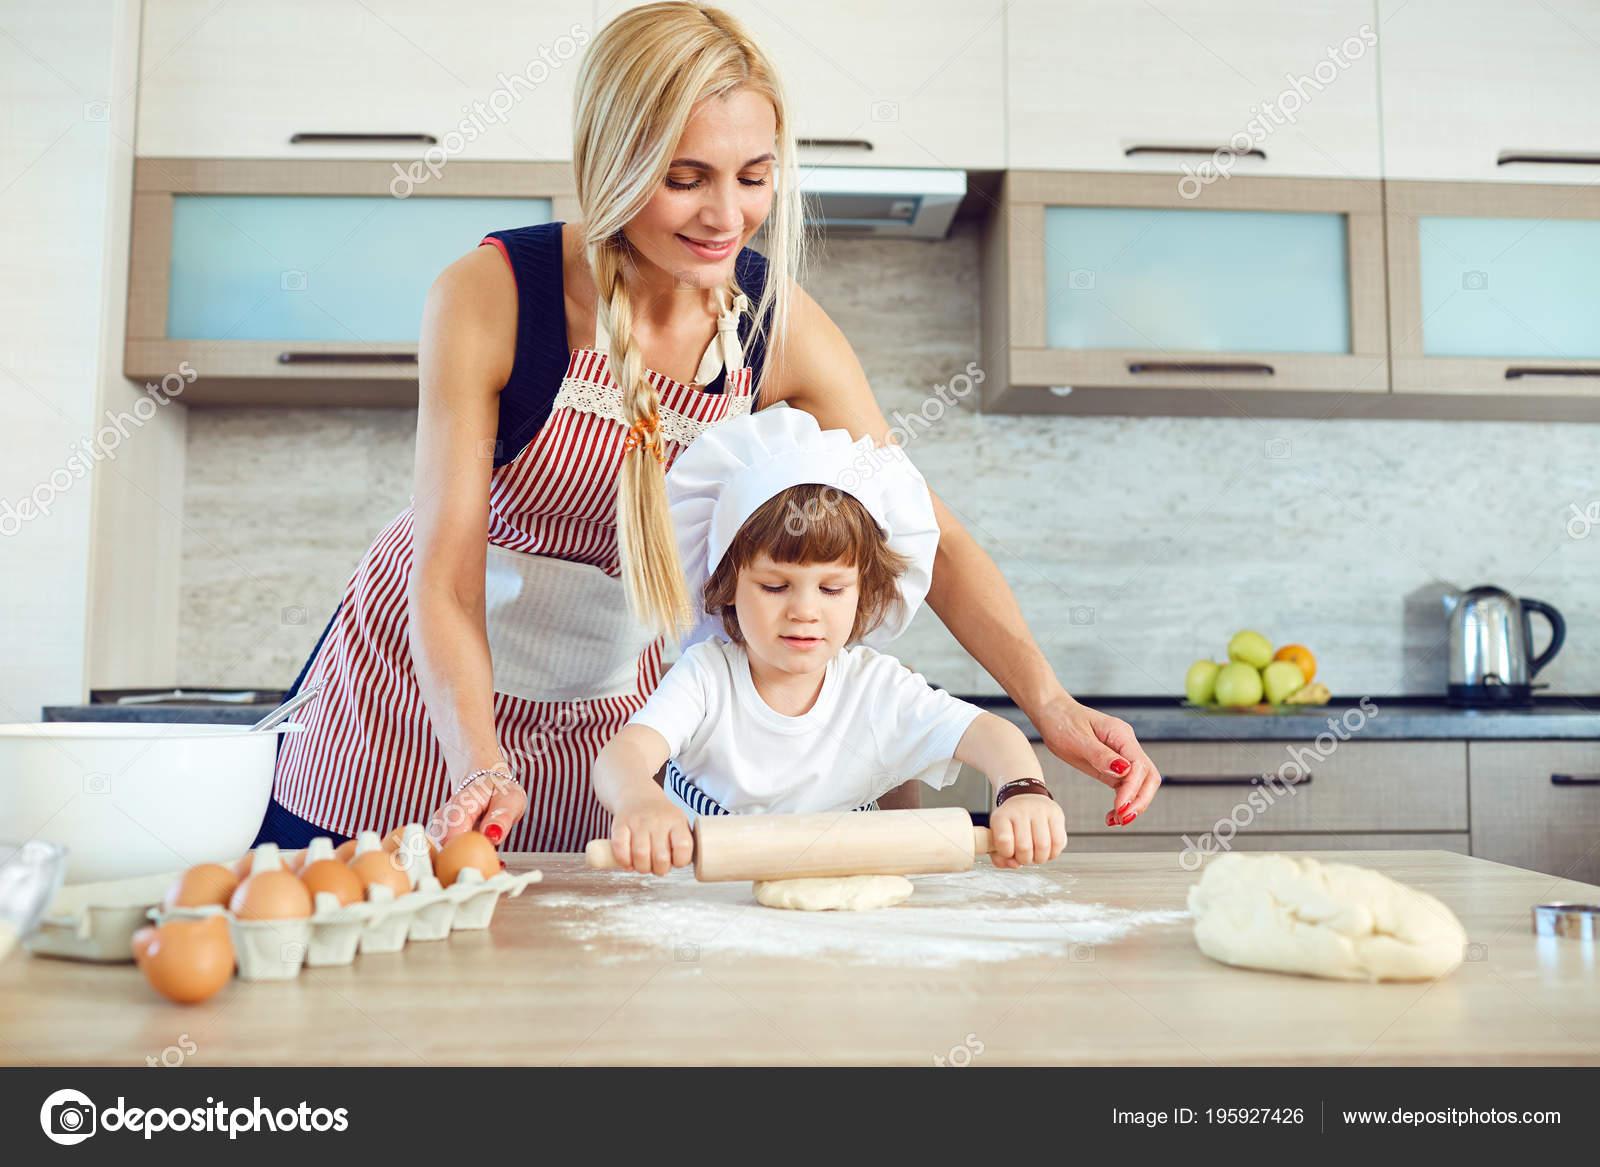 Сын трахнув маму в попу на кухни, Сын ебет маму в жопу на кухне - порно видео онлайн 18 фотография